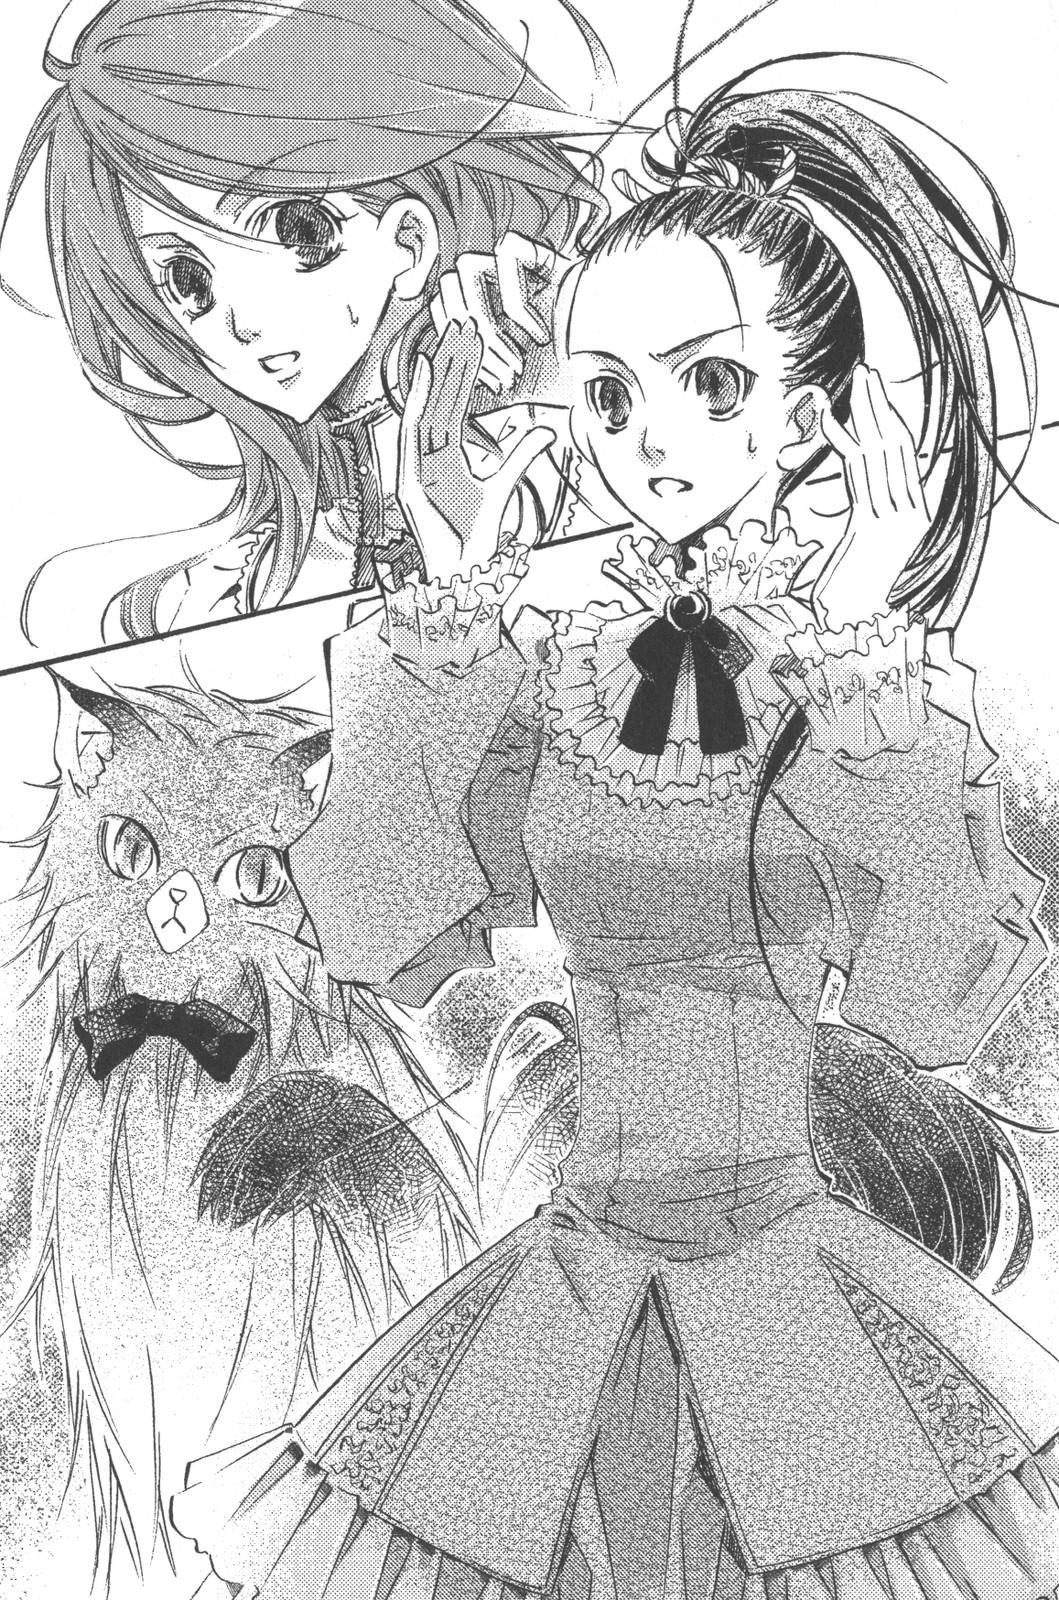 Hakushaku to Yousei (Earl And Fairy) Image #71393 ...